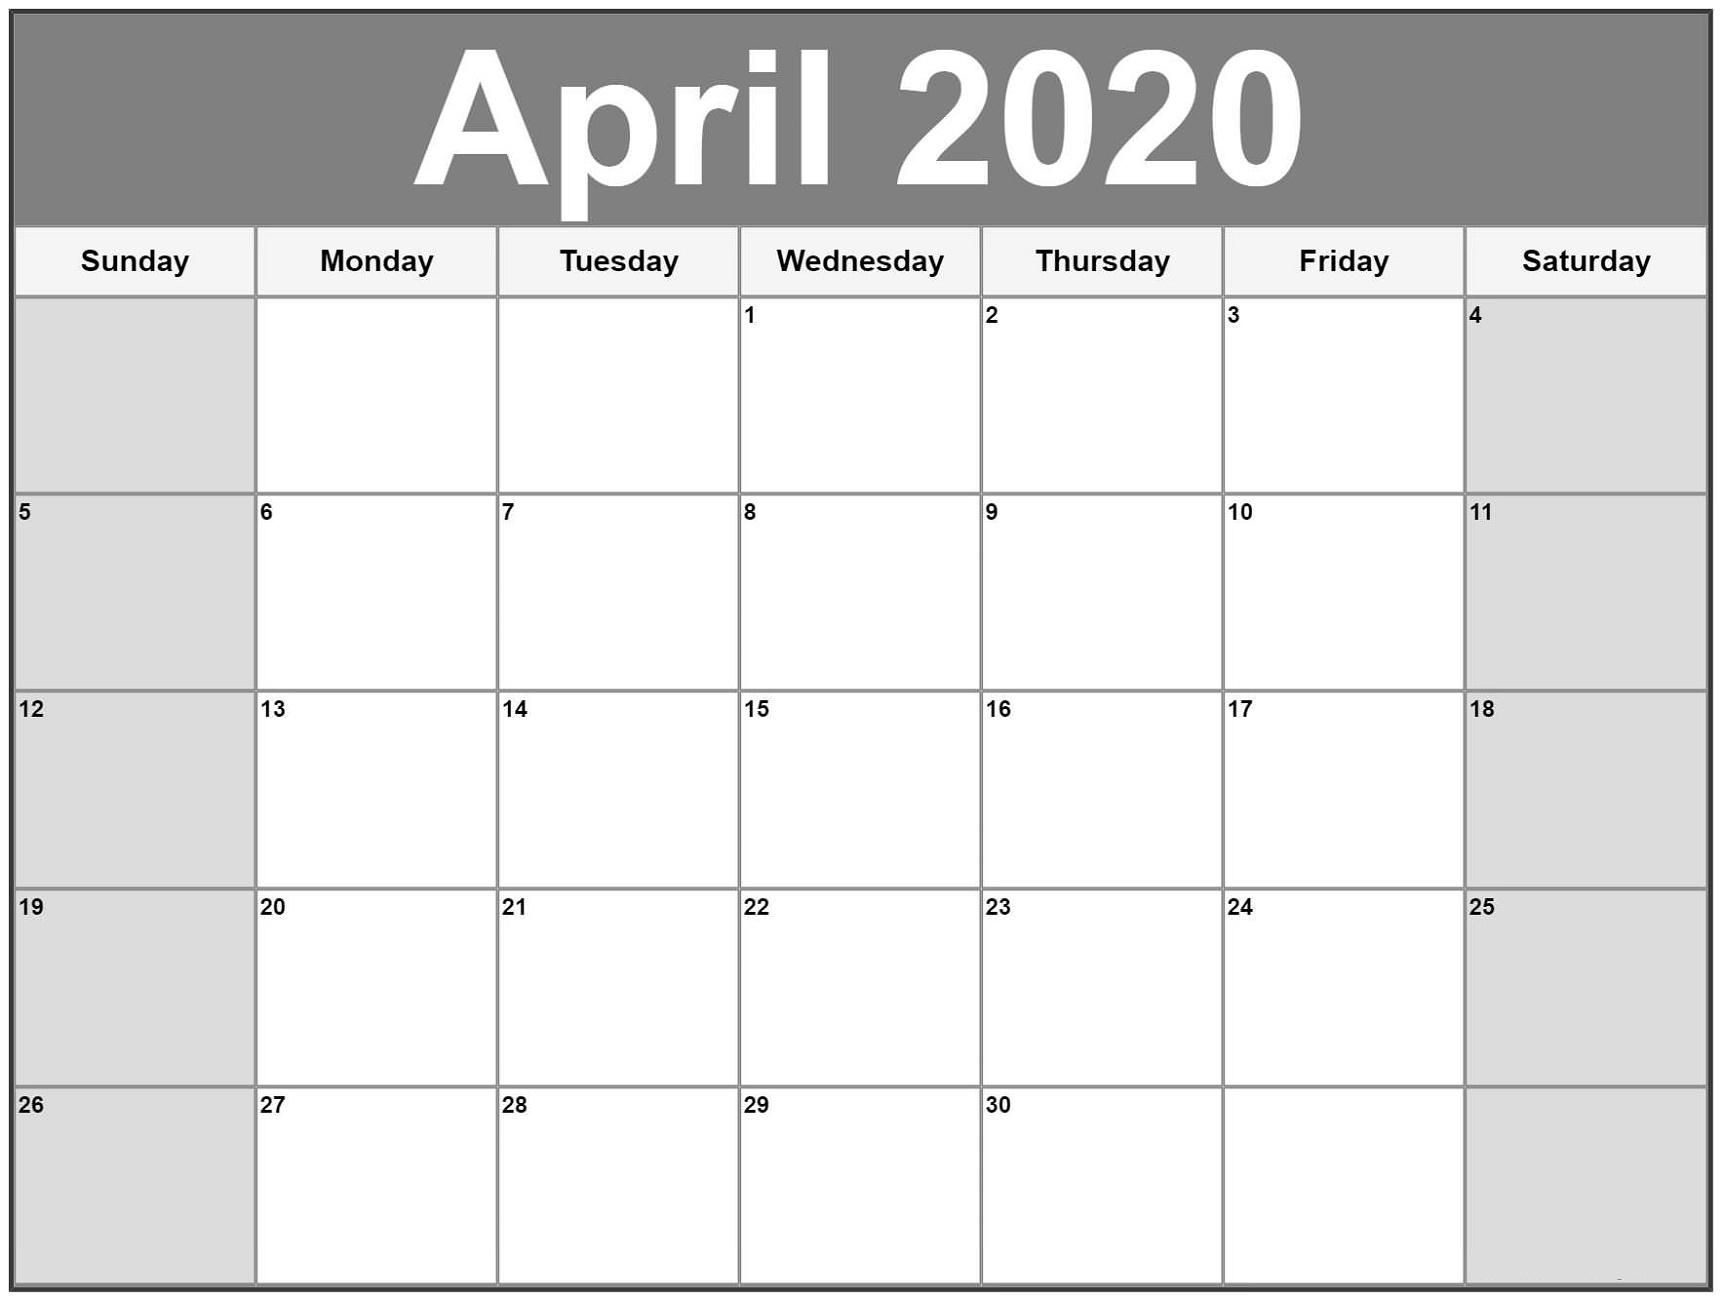 Free Printable Calendar 2020 | Calendar Shelter regarding Free Printable Pocket Size Calanders